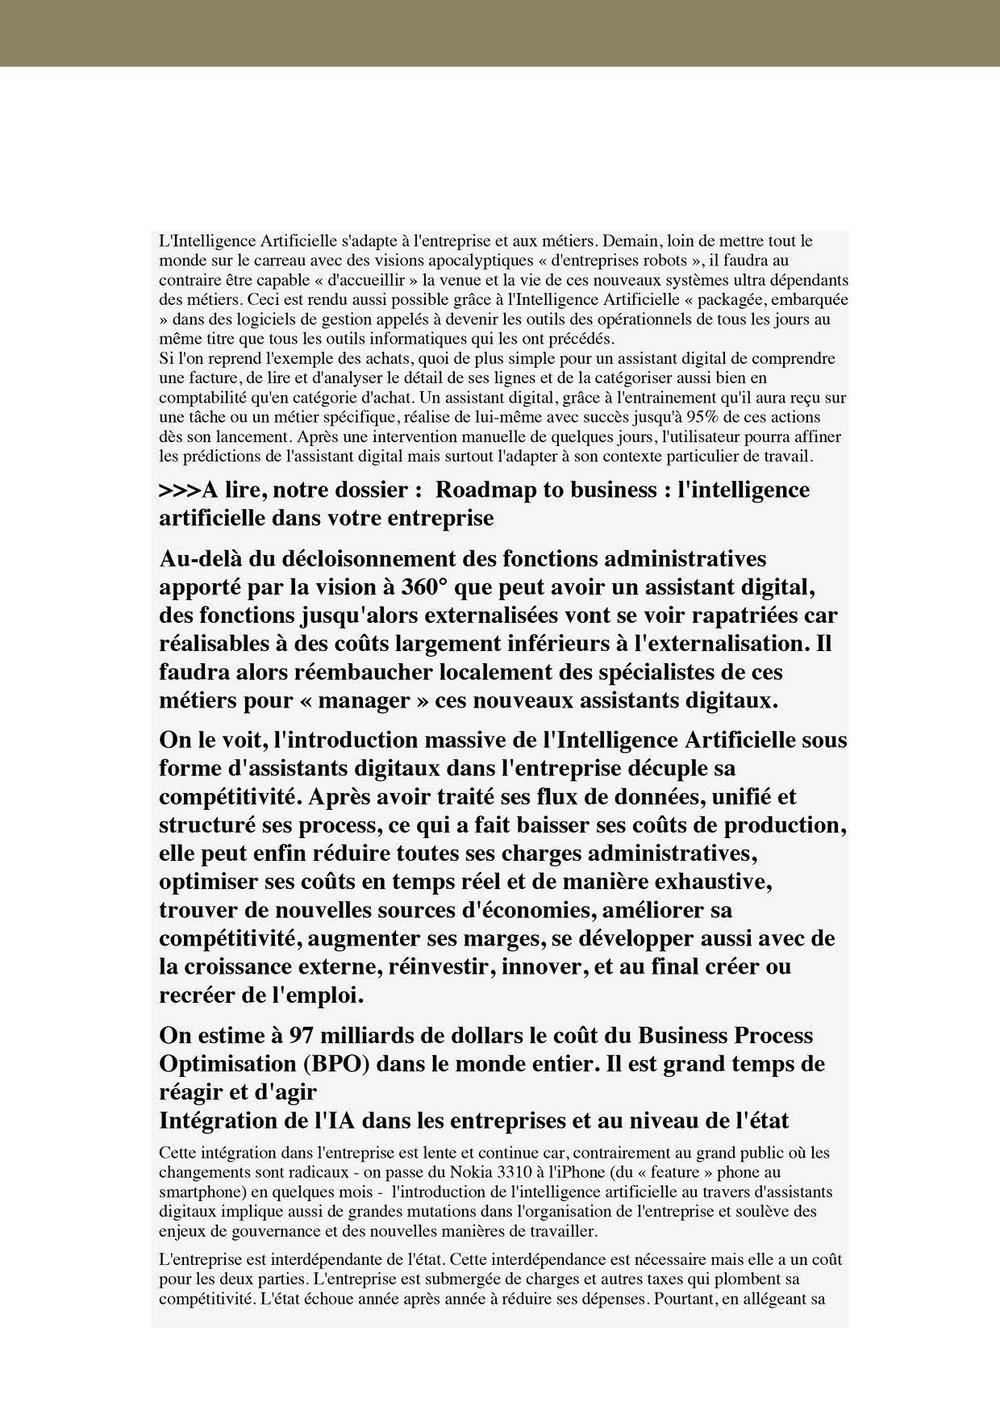 BOOKMEDIA_AOUT3.jpg